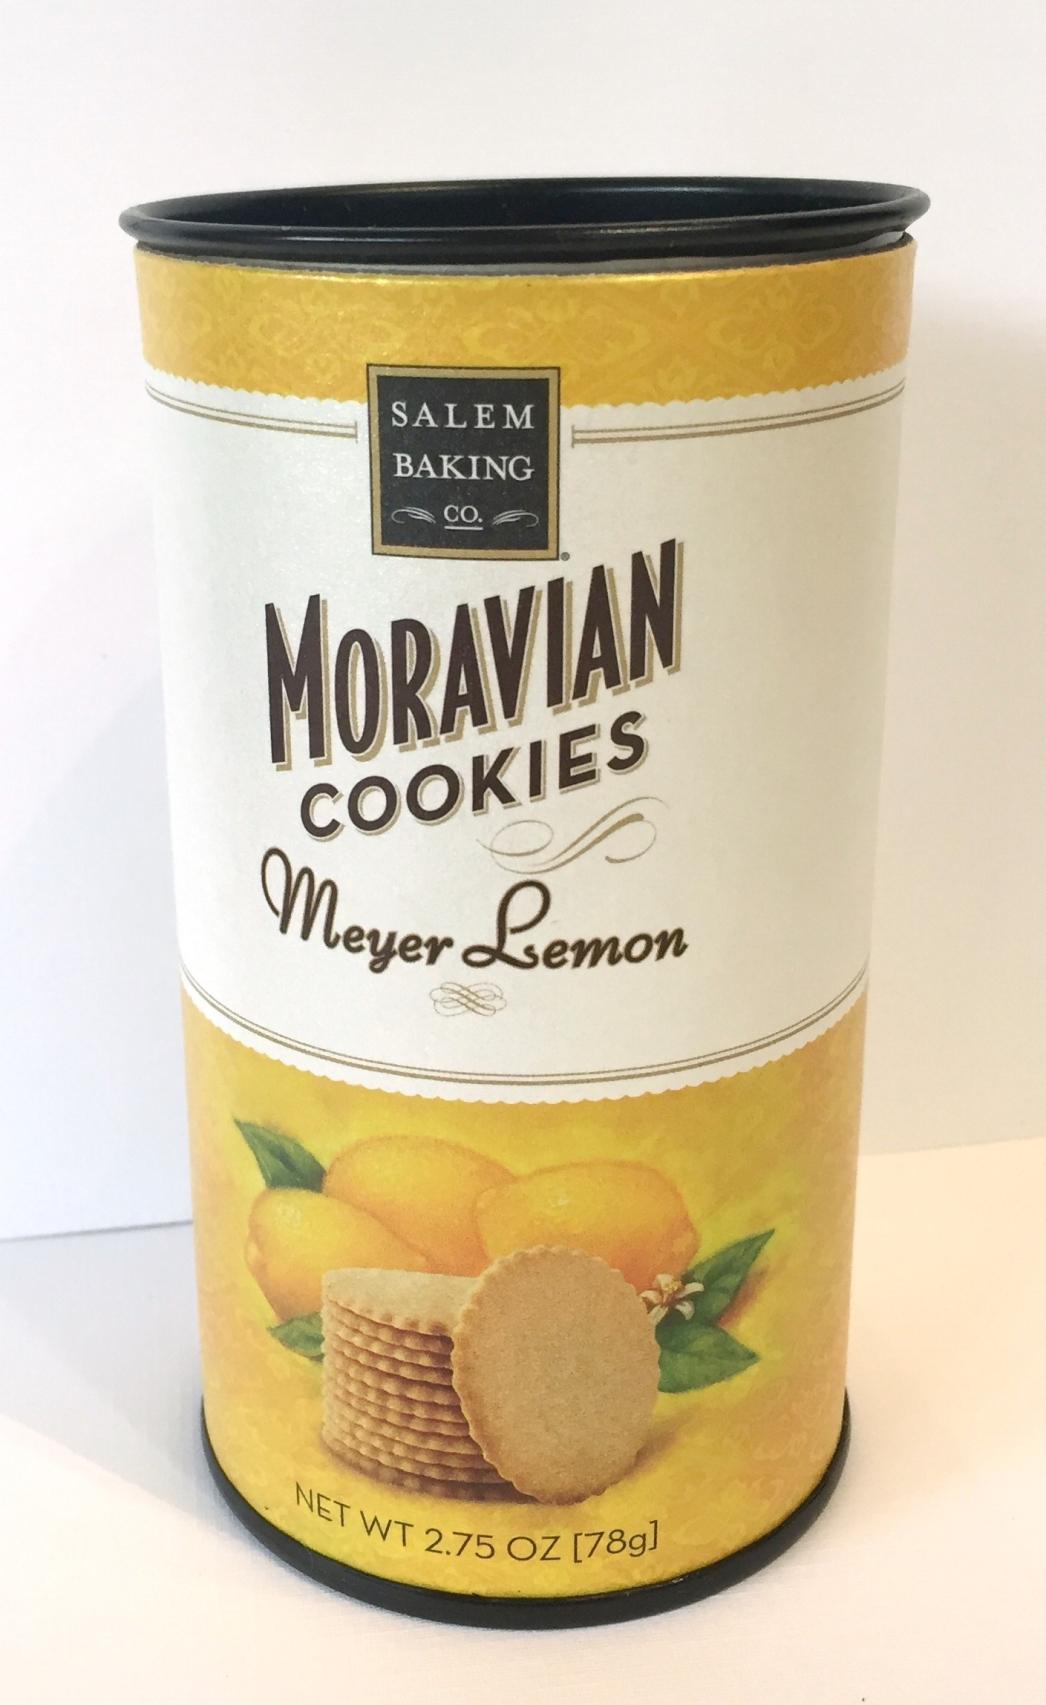 May Cookies